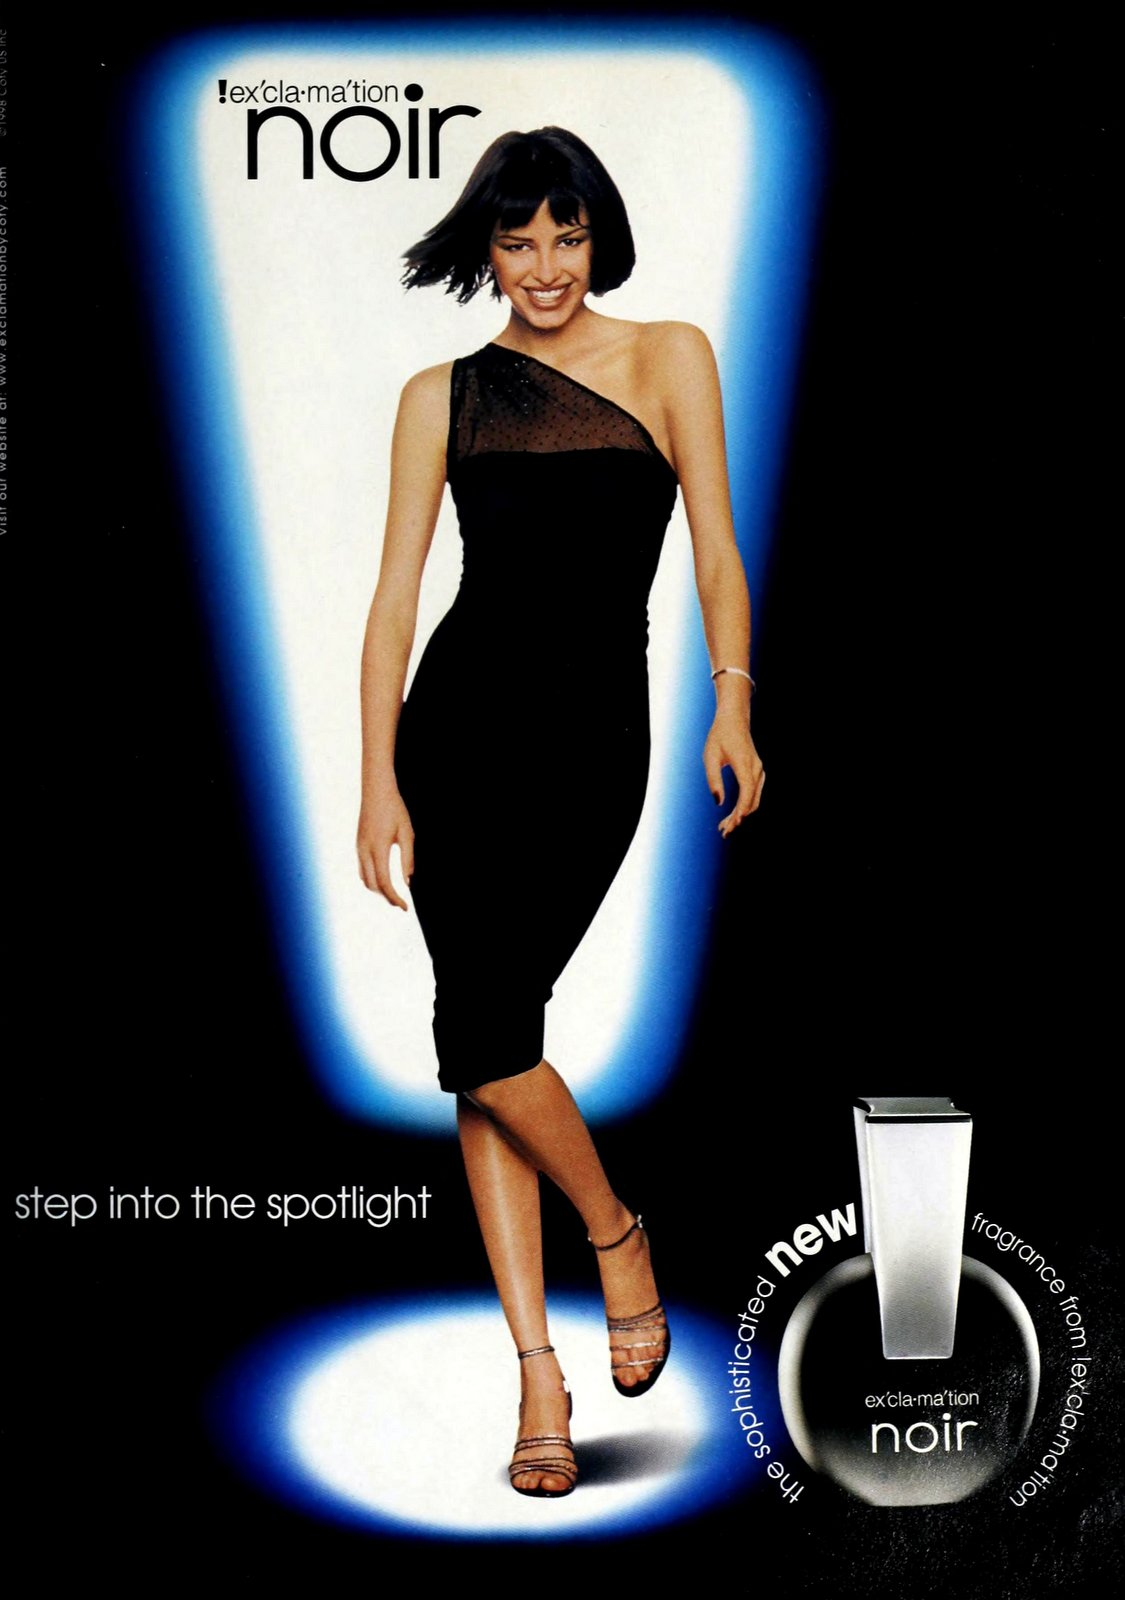 Exclamation Noir perfume (1998) at ClickAmericana.com